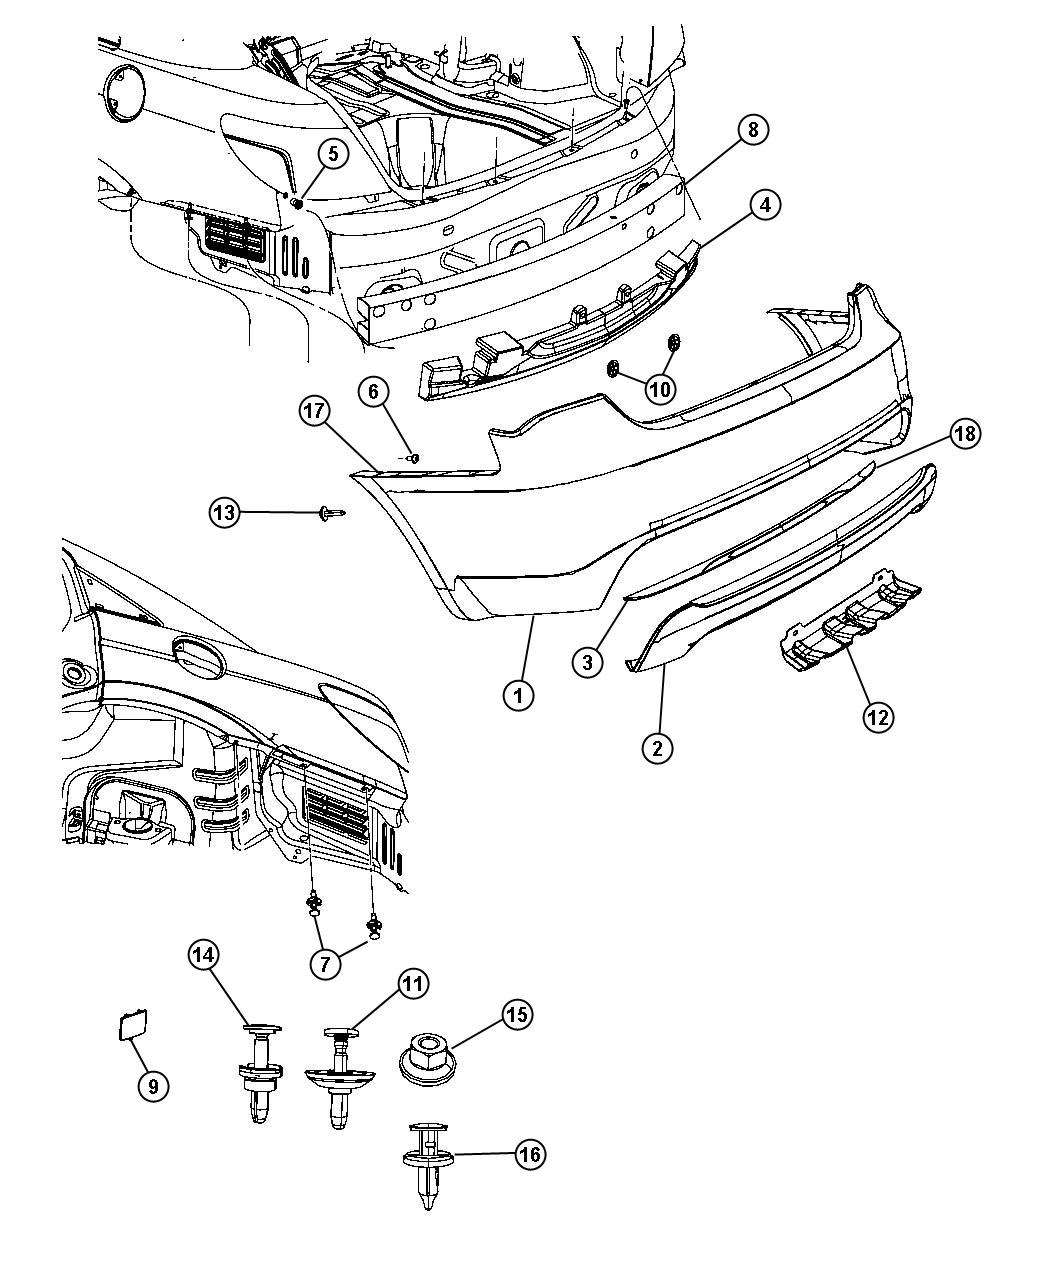 Dodge Charger Srt8 Coloring Pages Sketch Templates additionally  on 2012 dodge charger srt8 police car